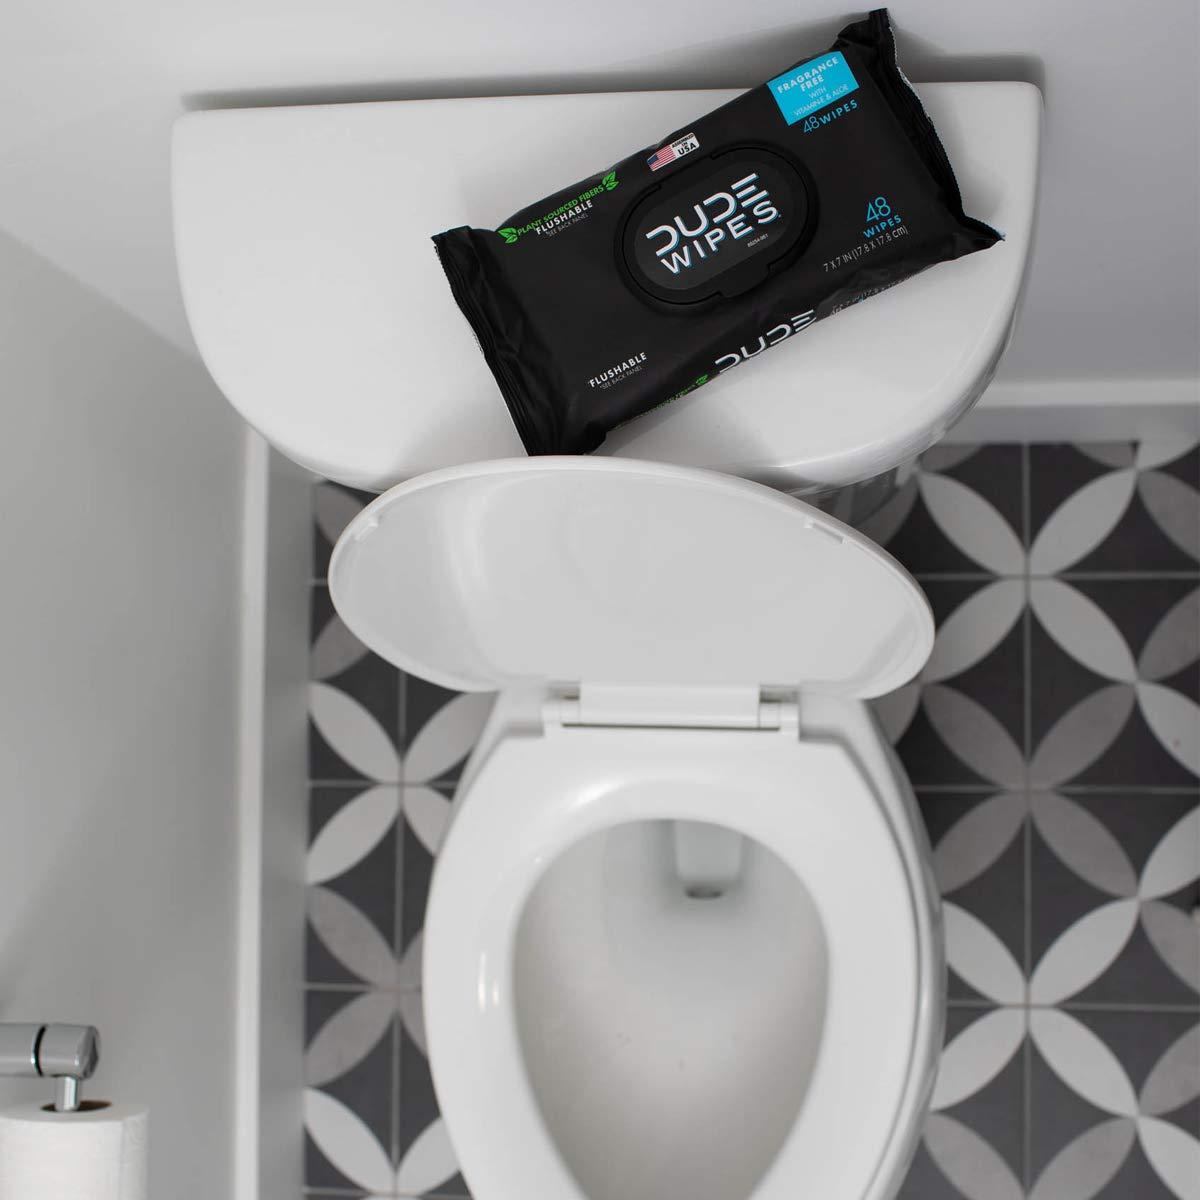 DUDE Wipes Flushable Wet Wipes Dispenser